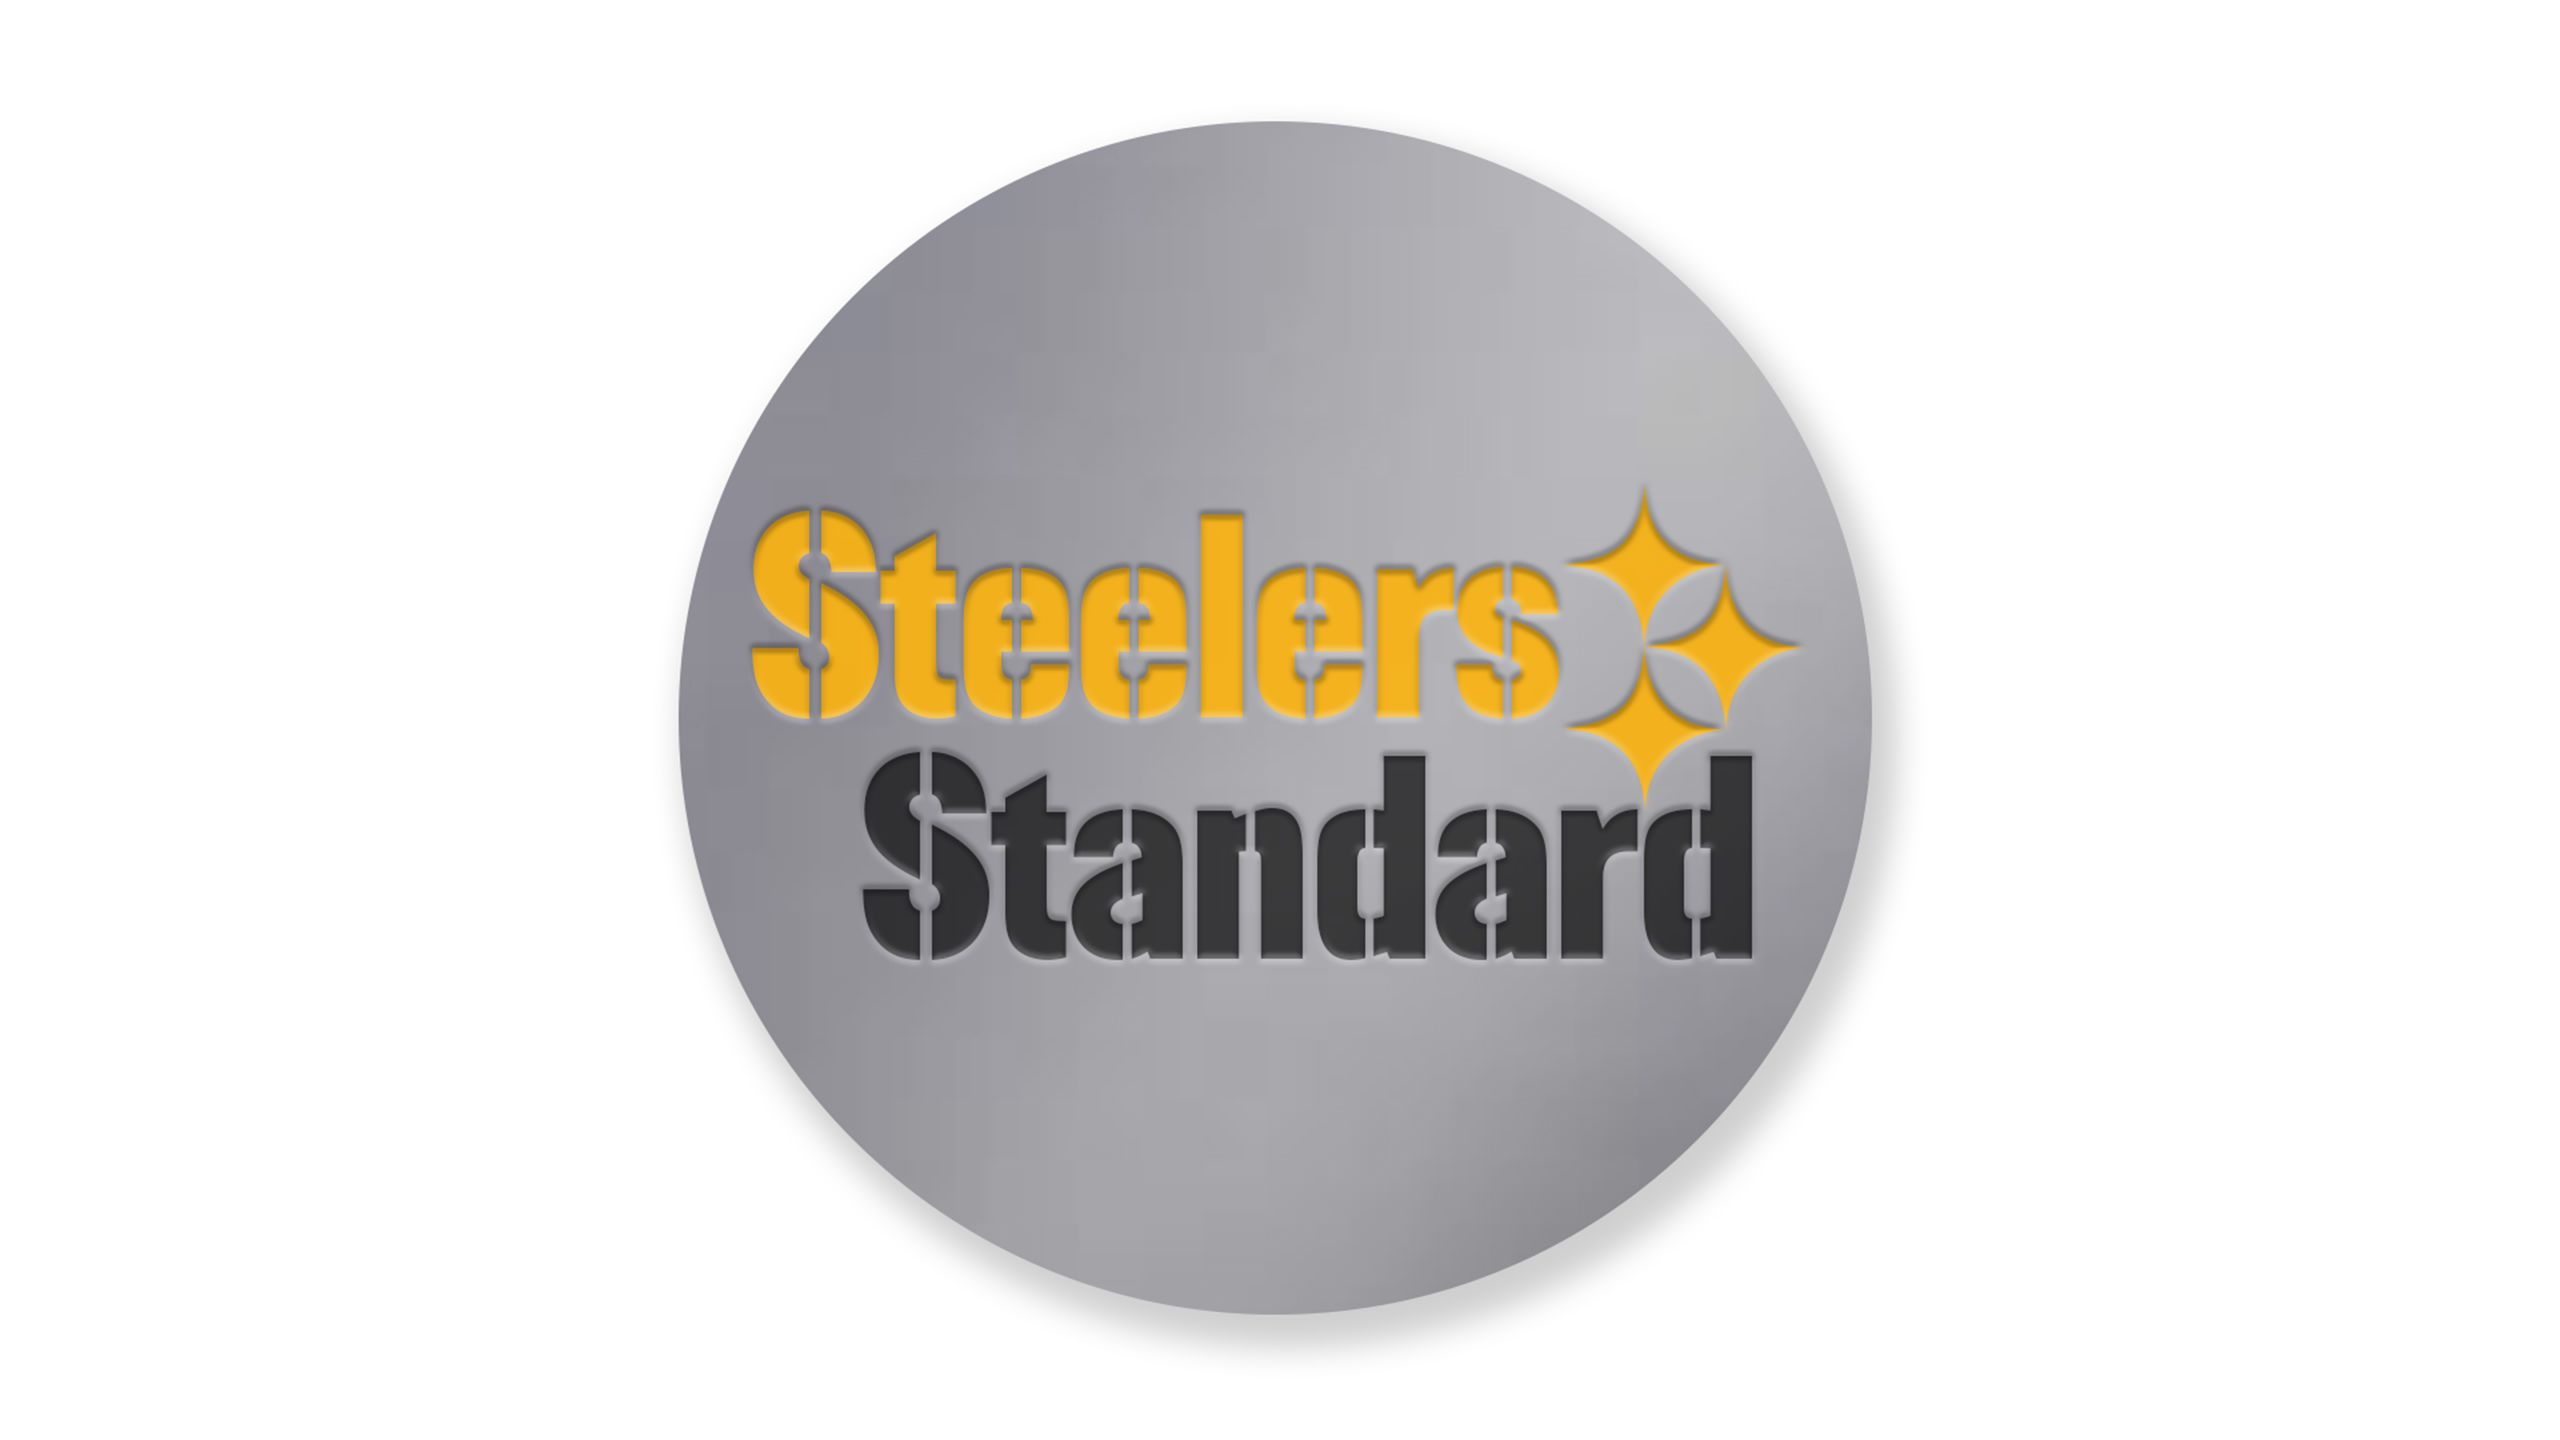 Steelers Standard